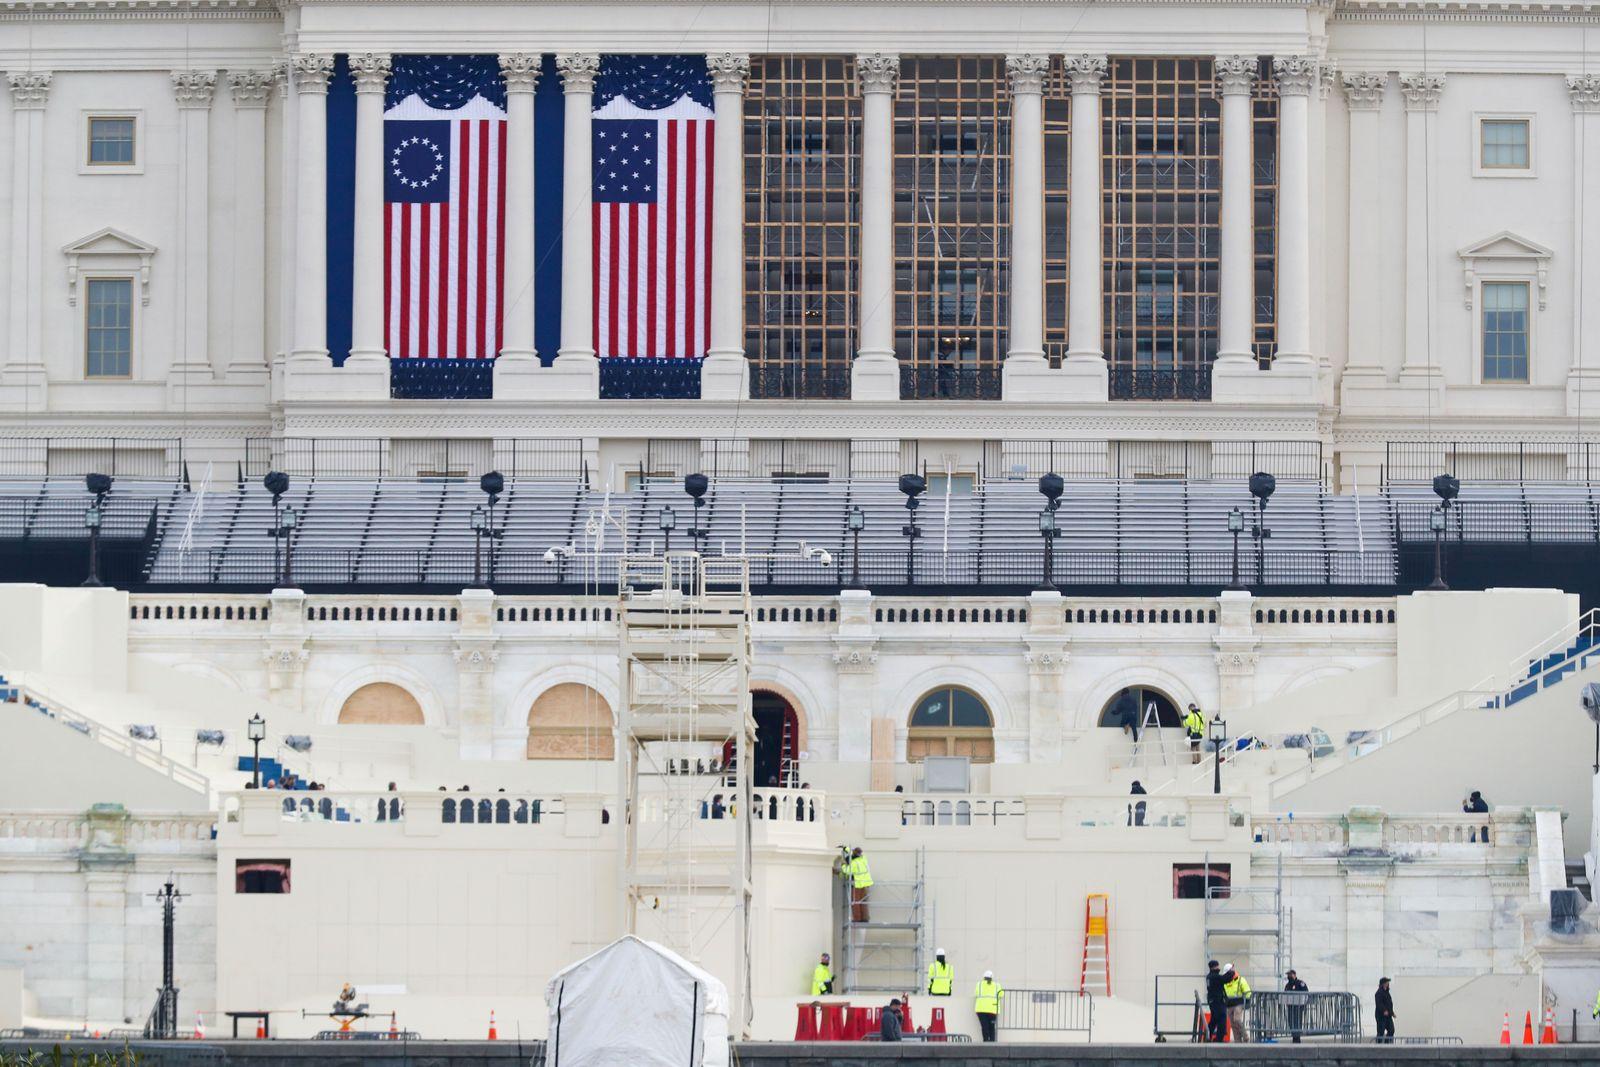 US Capitol Security, Washington, USA - 11 Jan 2021